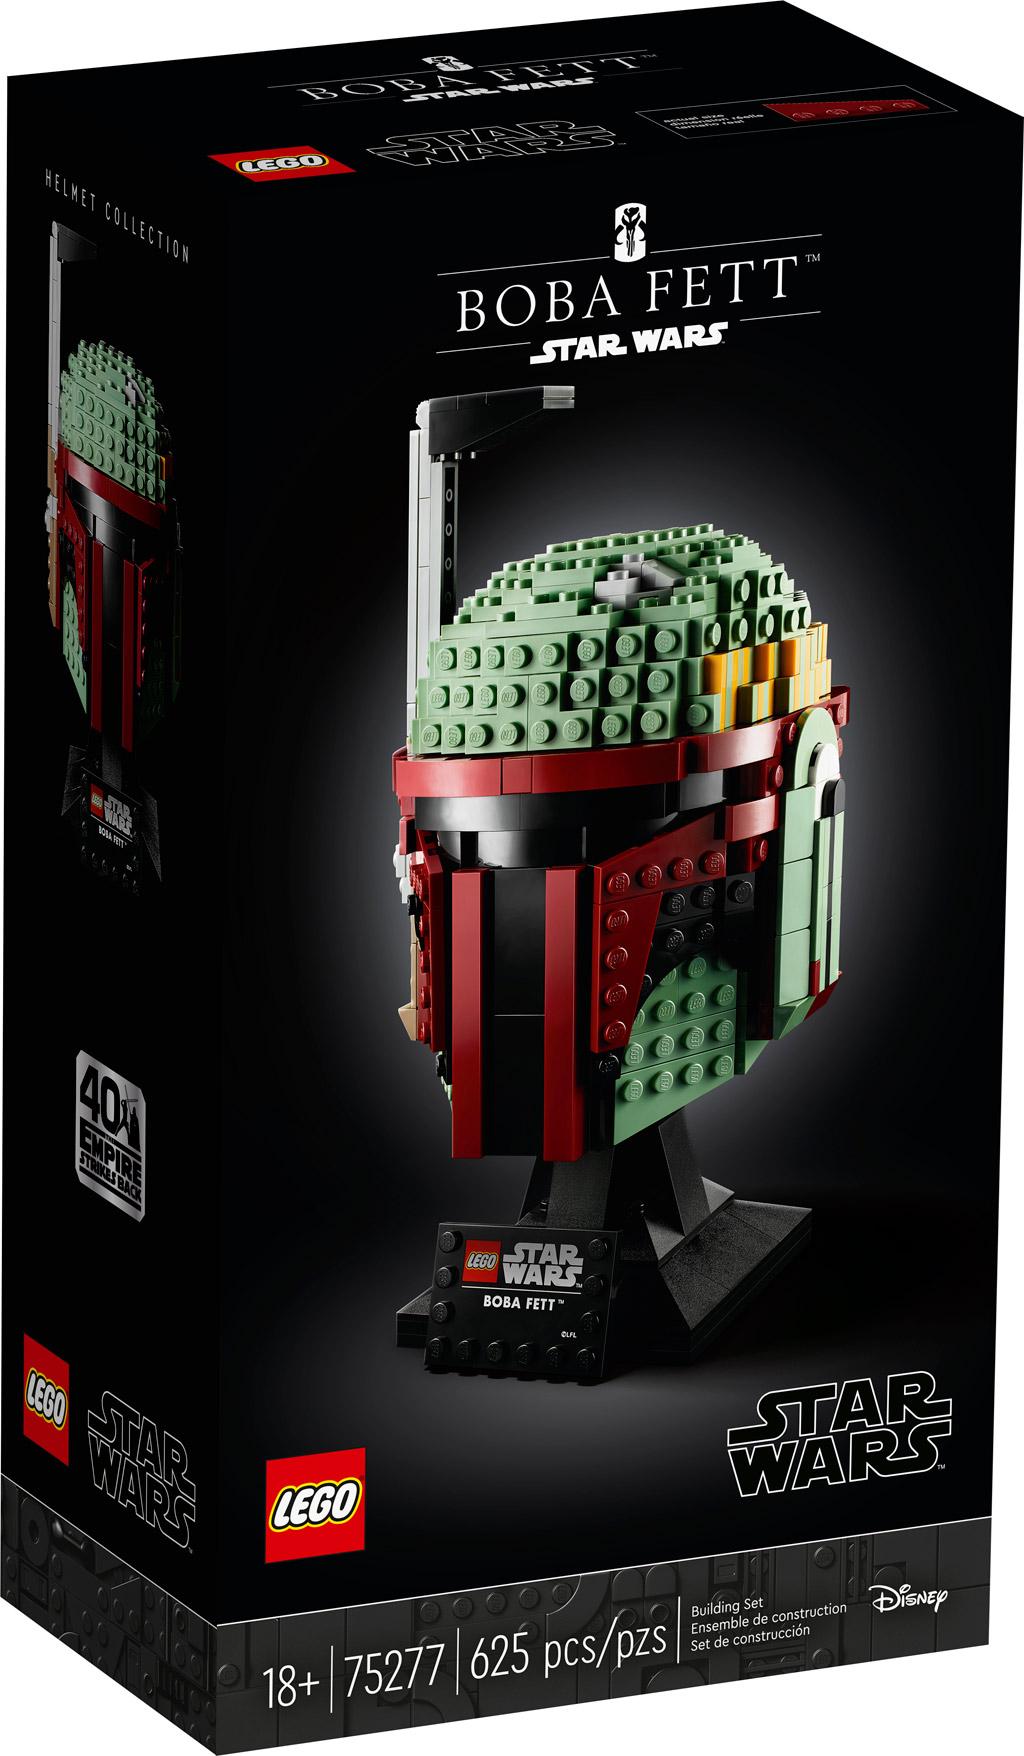 lego-star-wars-75277-boba-fett-box-front-2020 zusammengebaut.com